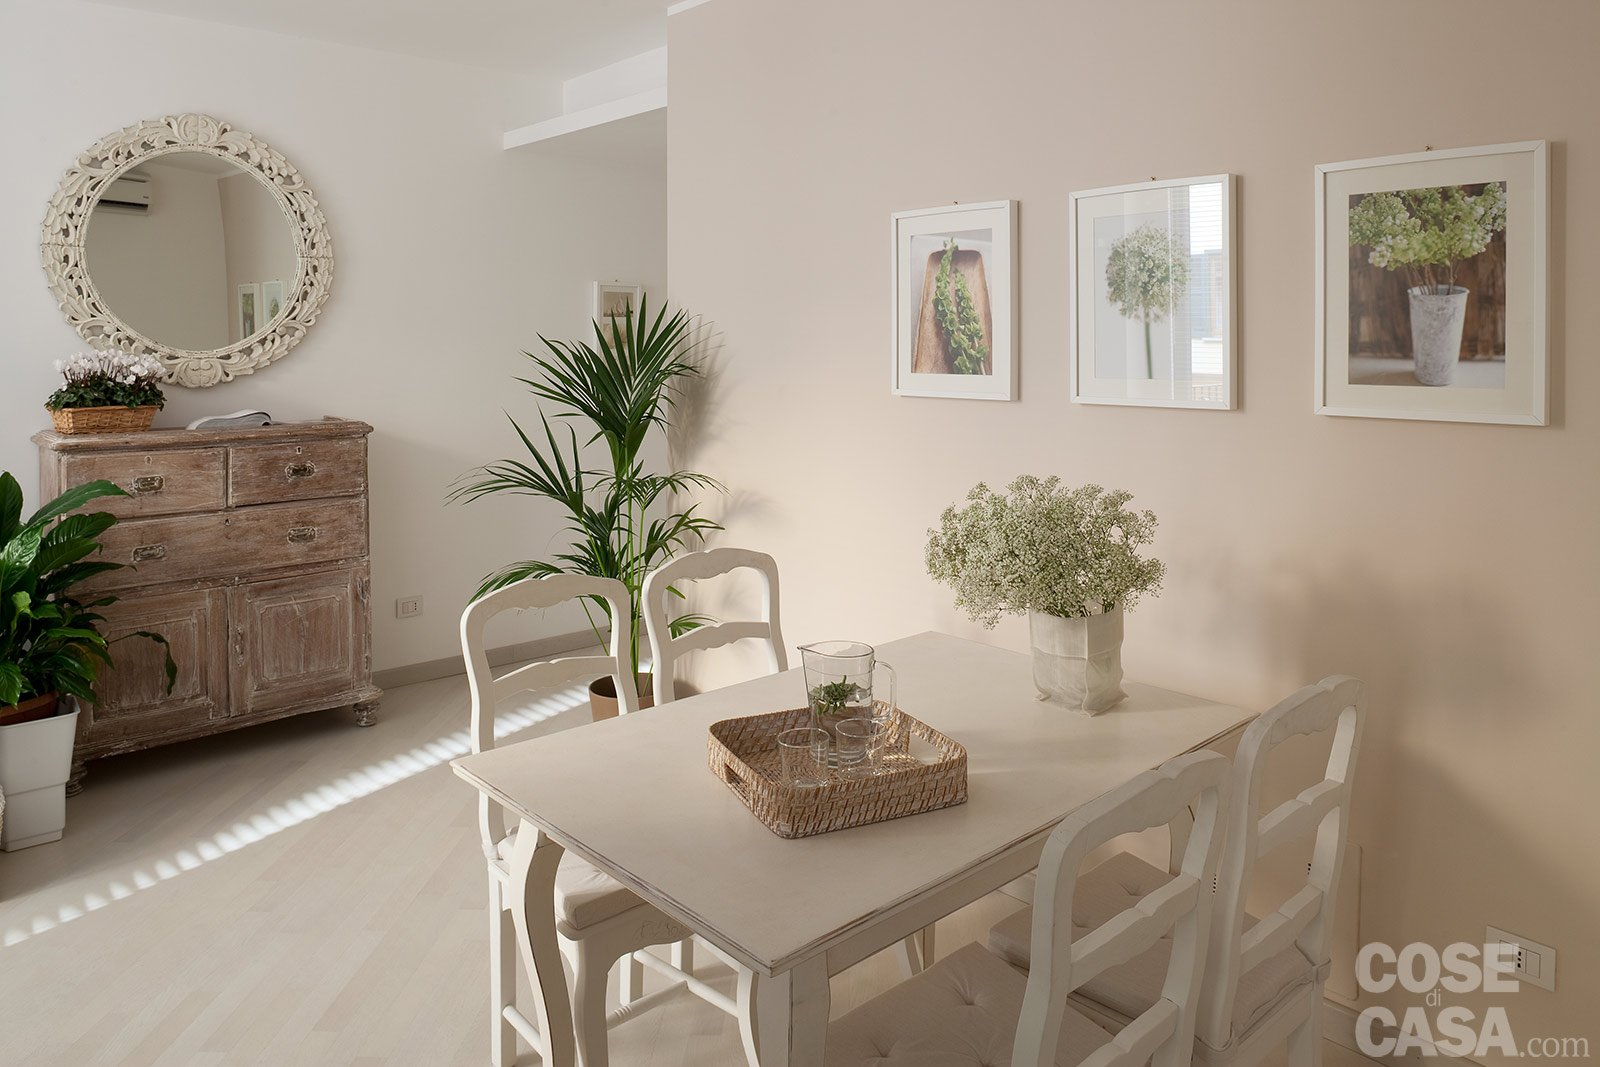 44 mq una stanza in pi in casa cose di casa for Maison du monde arredo bagno